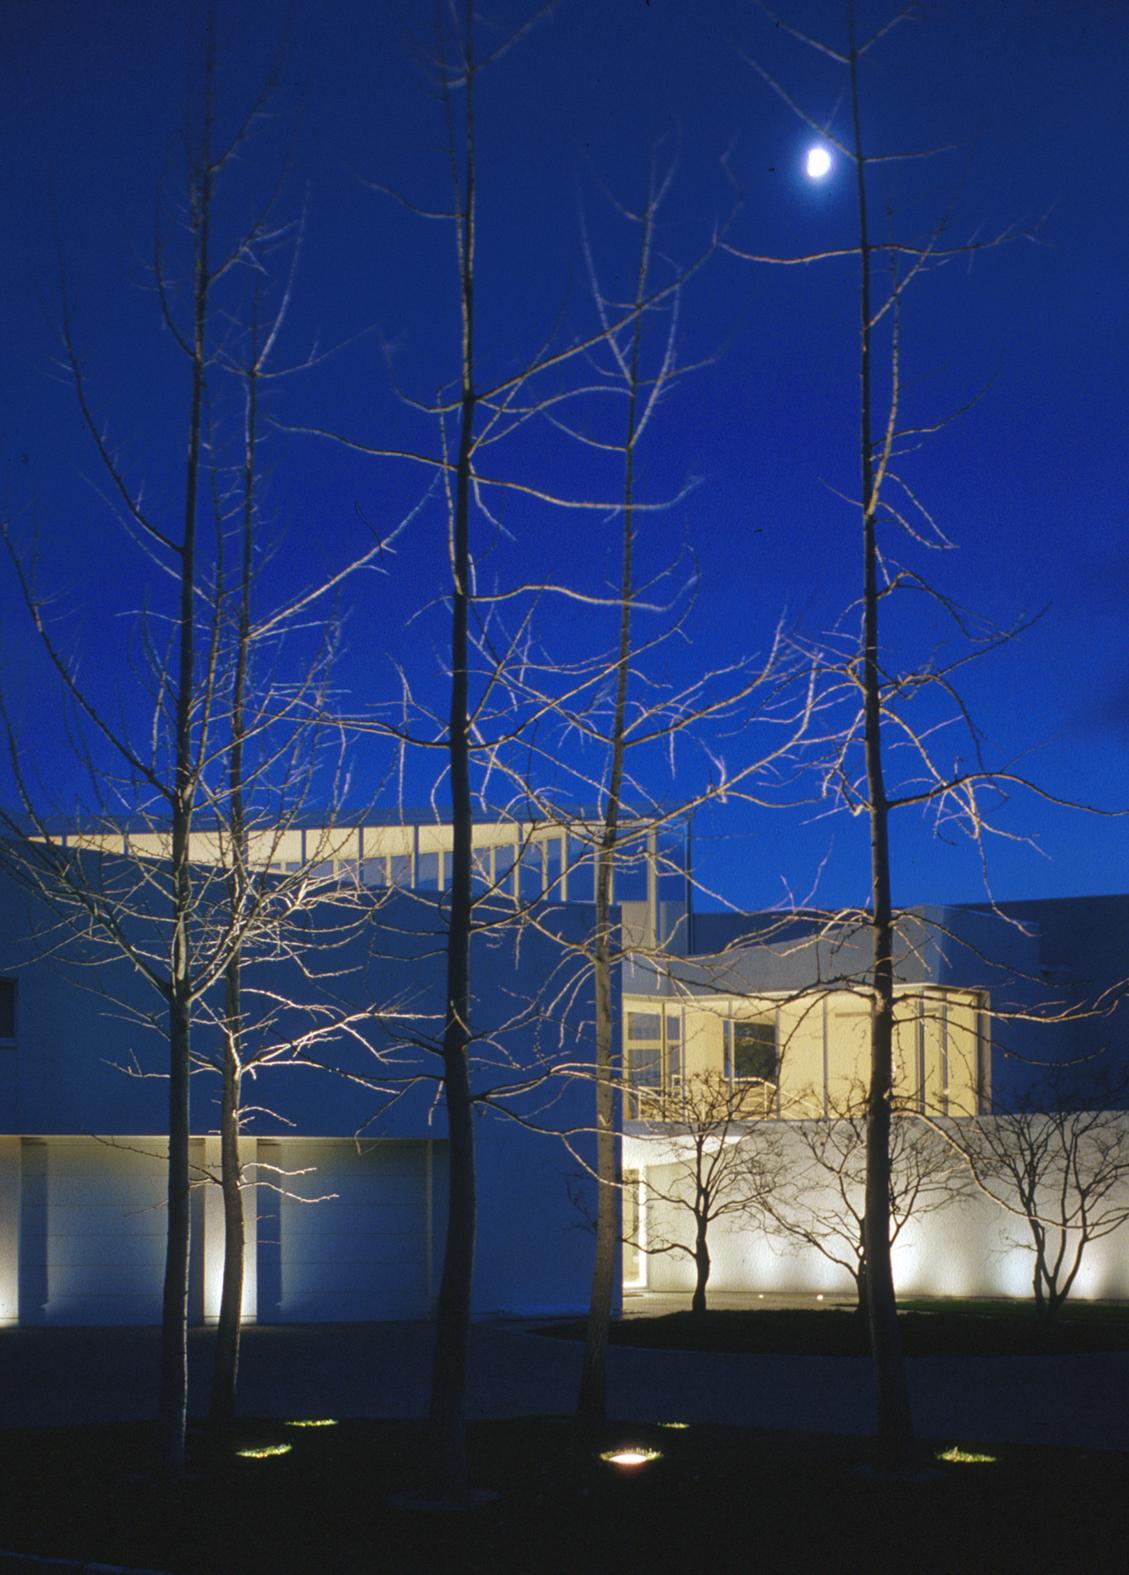 HouseonCoast-night w trees.jpg